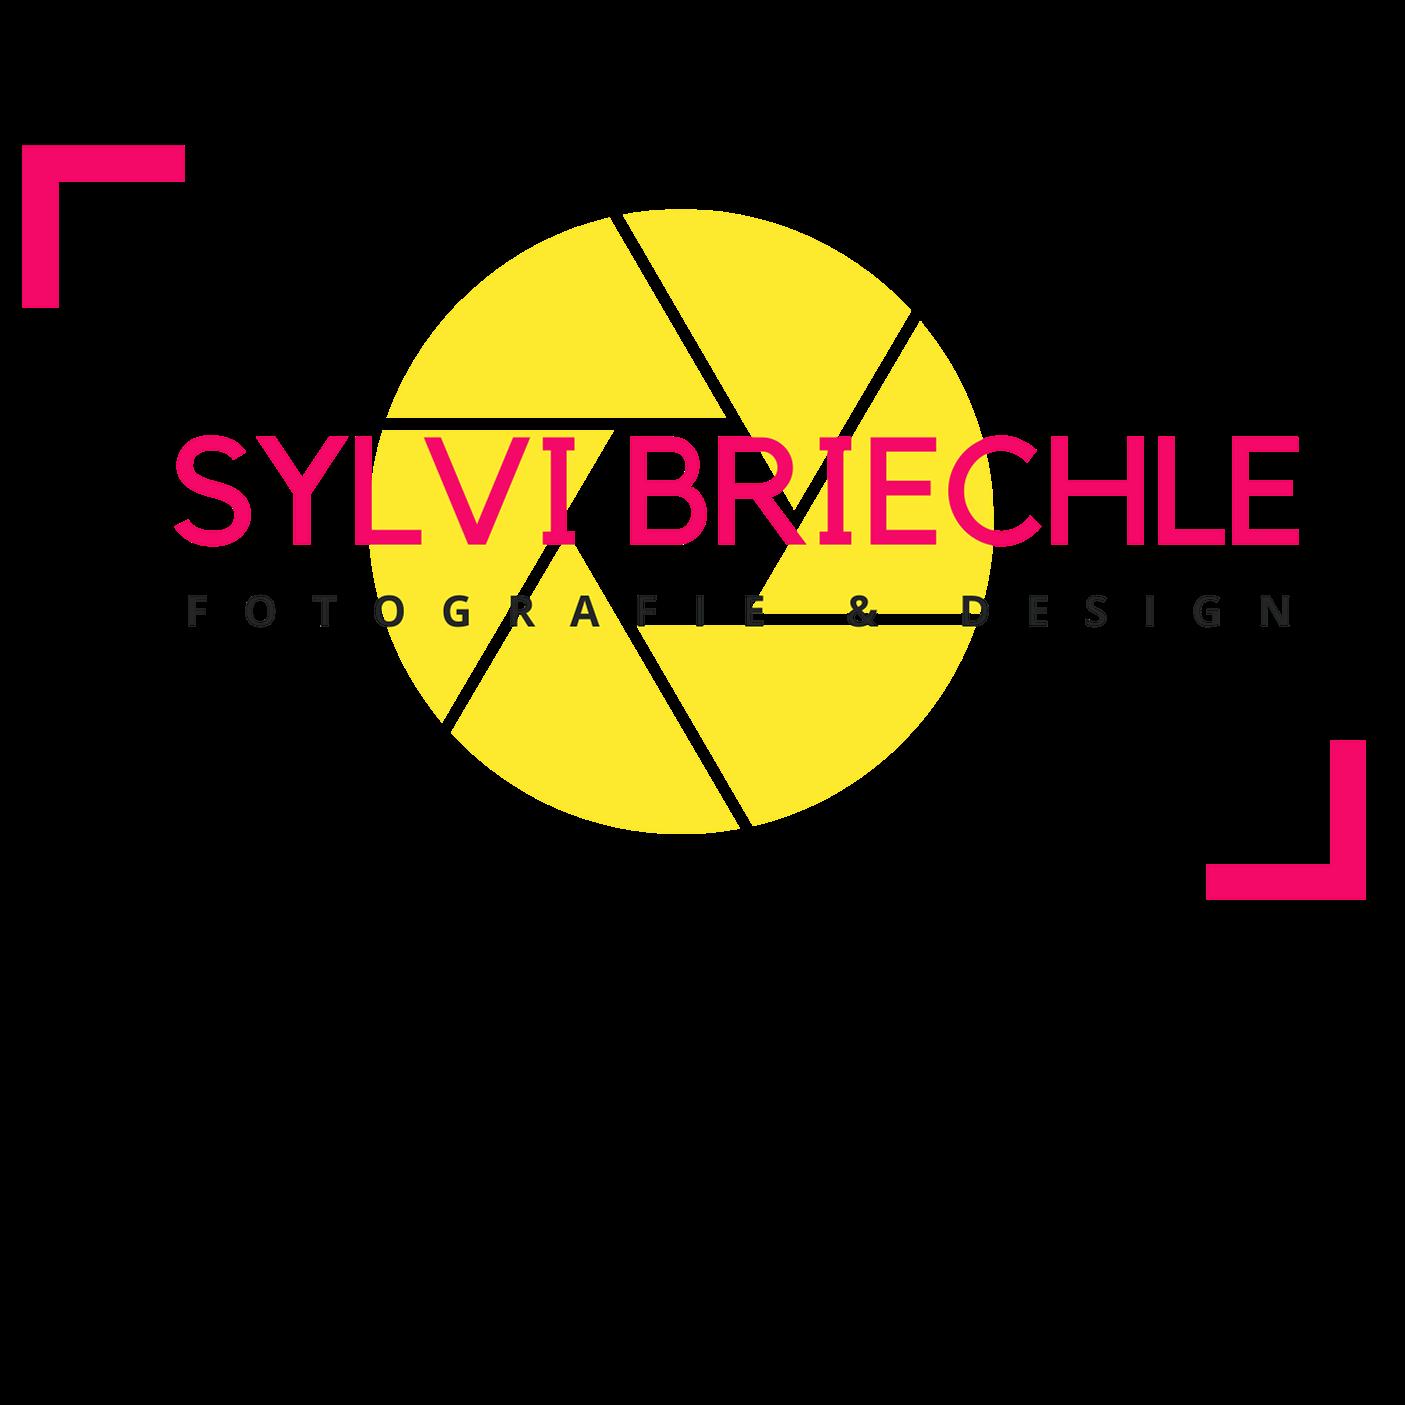 Sylvi Briechle